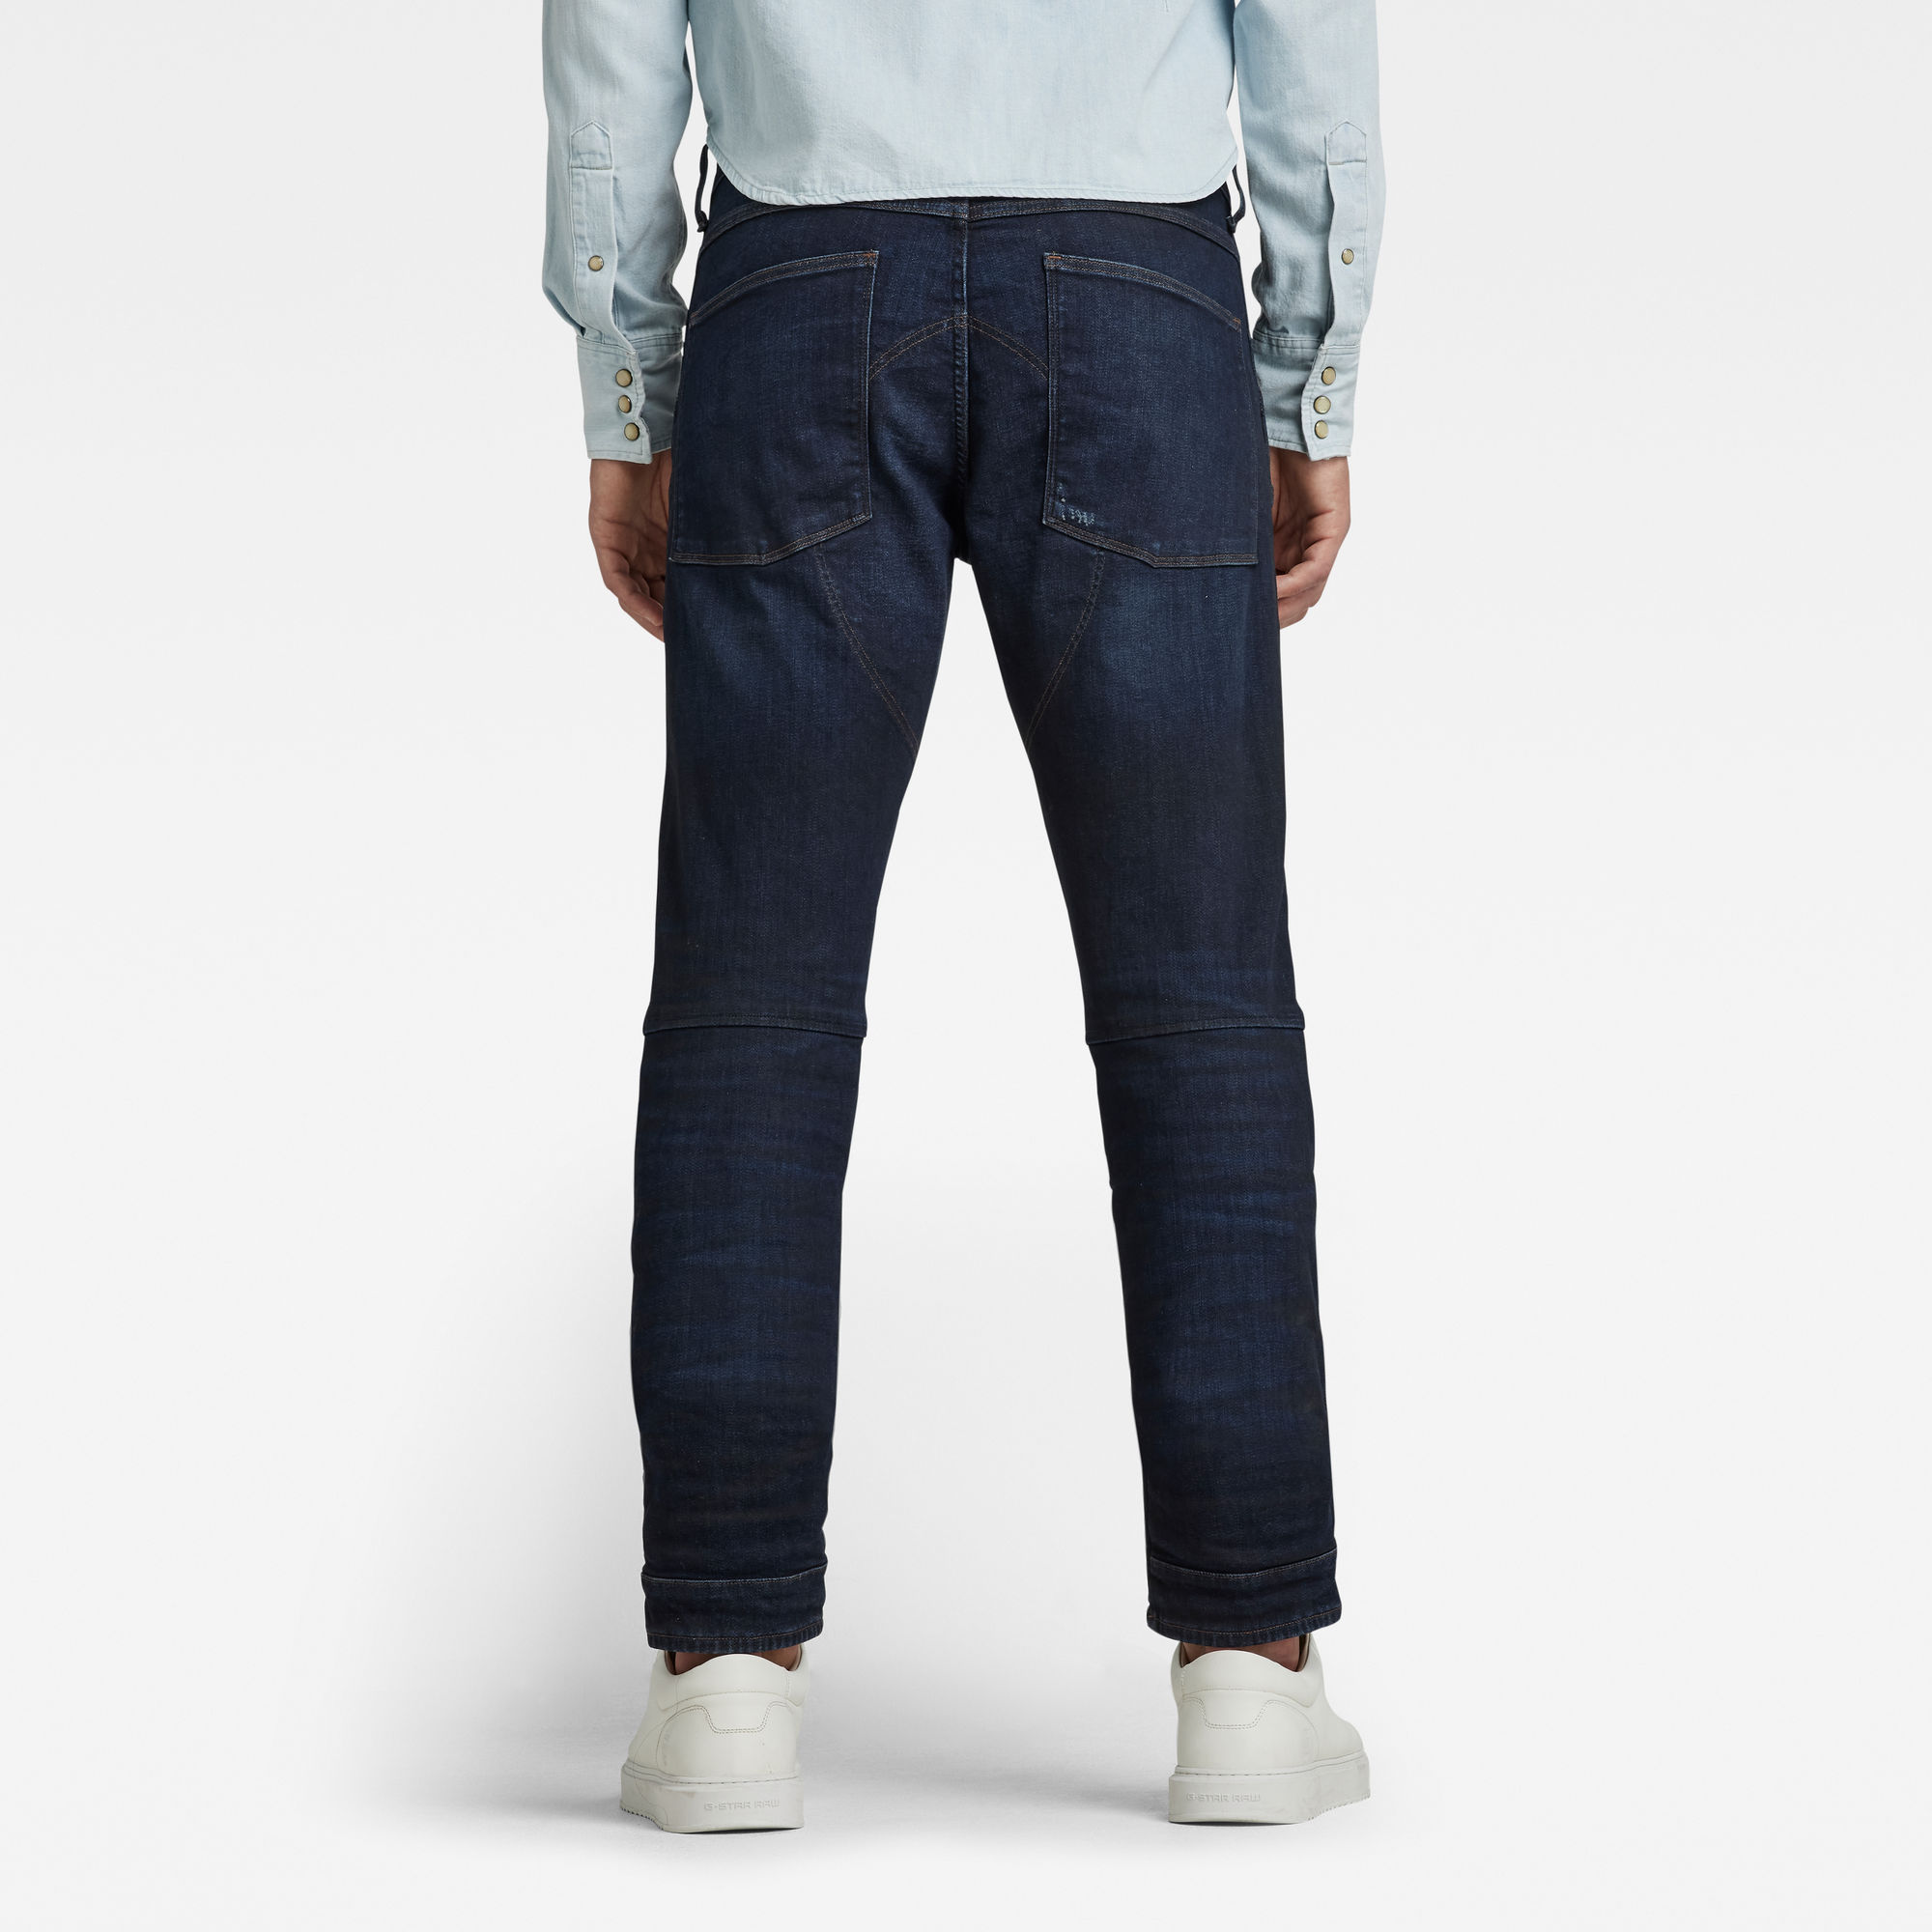 G-Star RAW 5620 G-Star Elwood 3D Slim Jeans